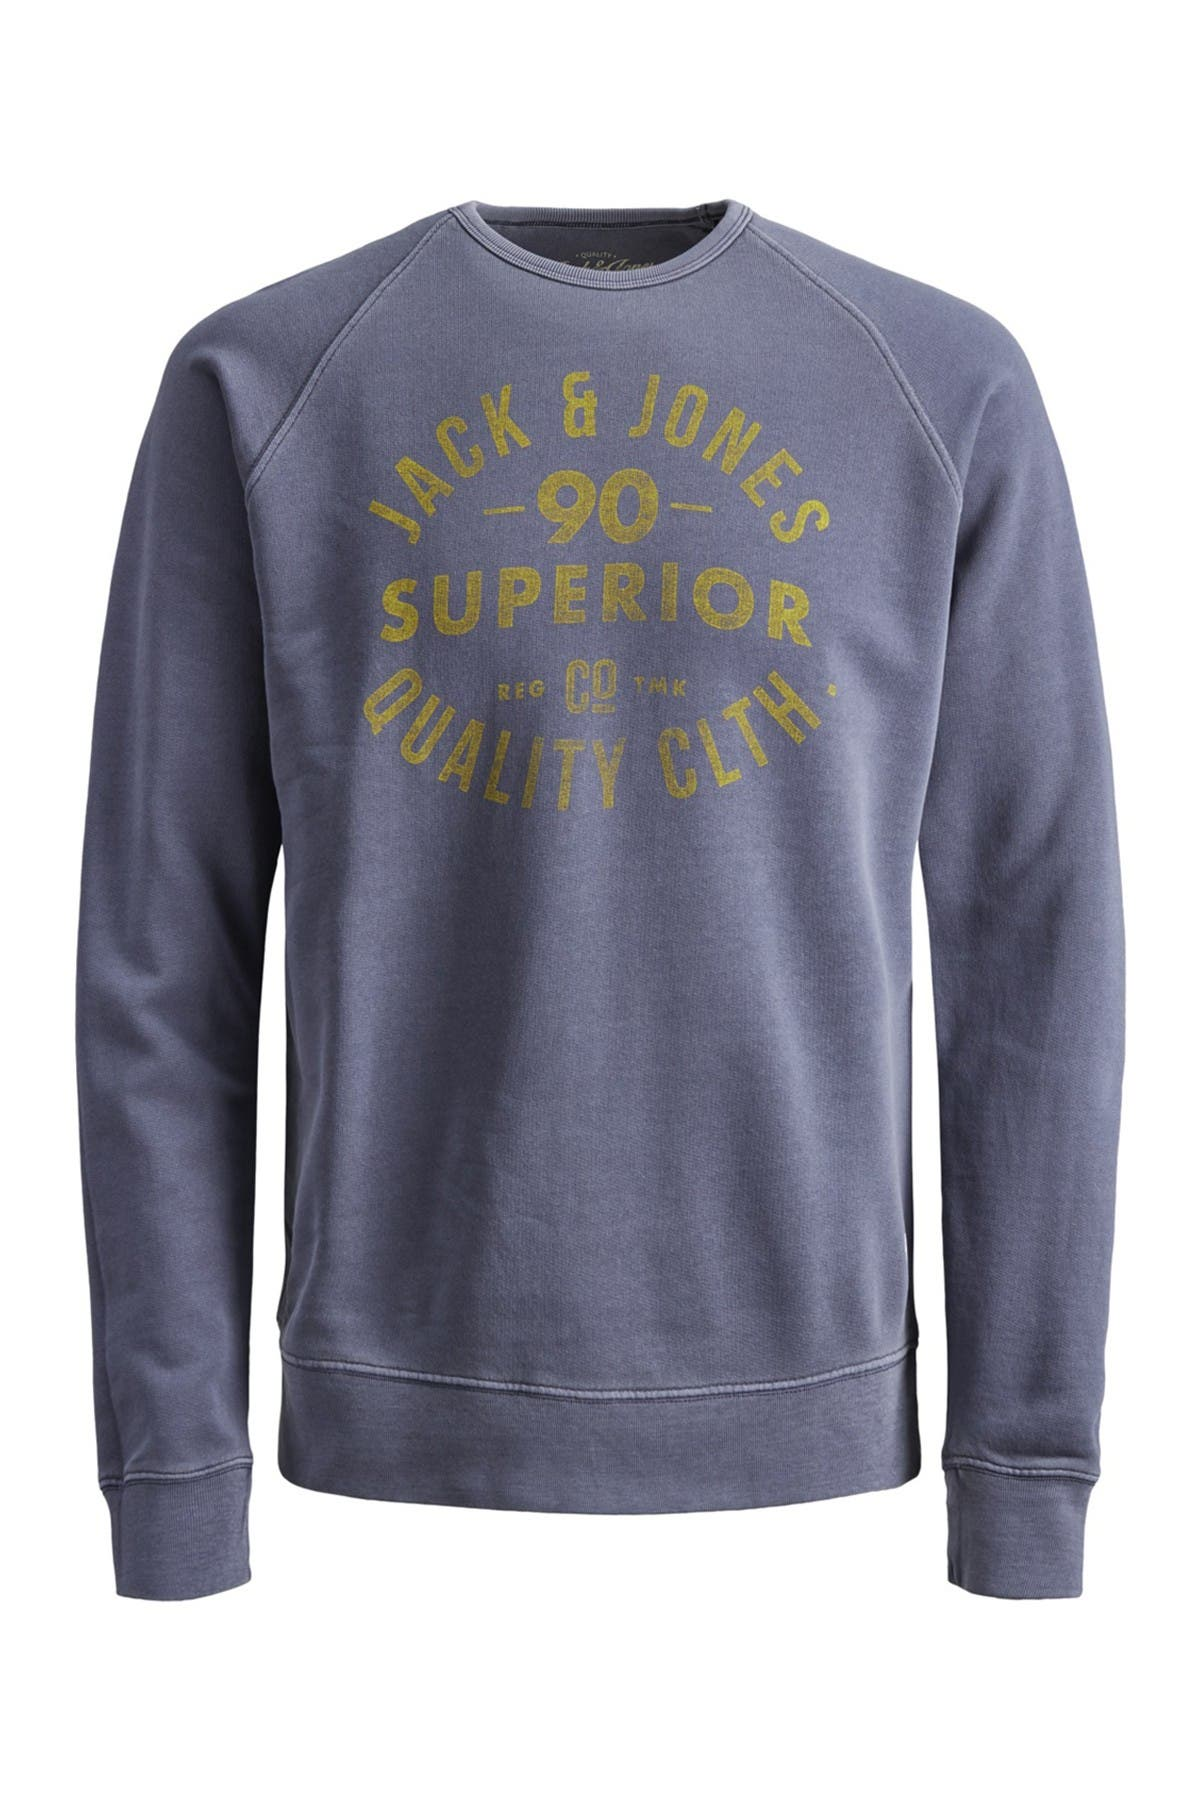 Image of JACK & JONES Vintage Logo Raglan Sweatshirt